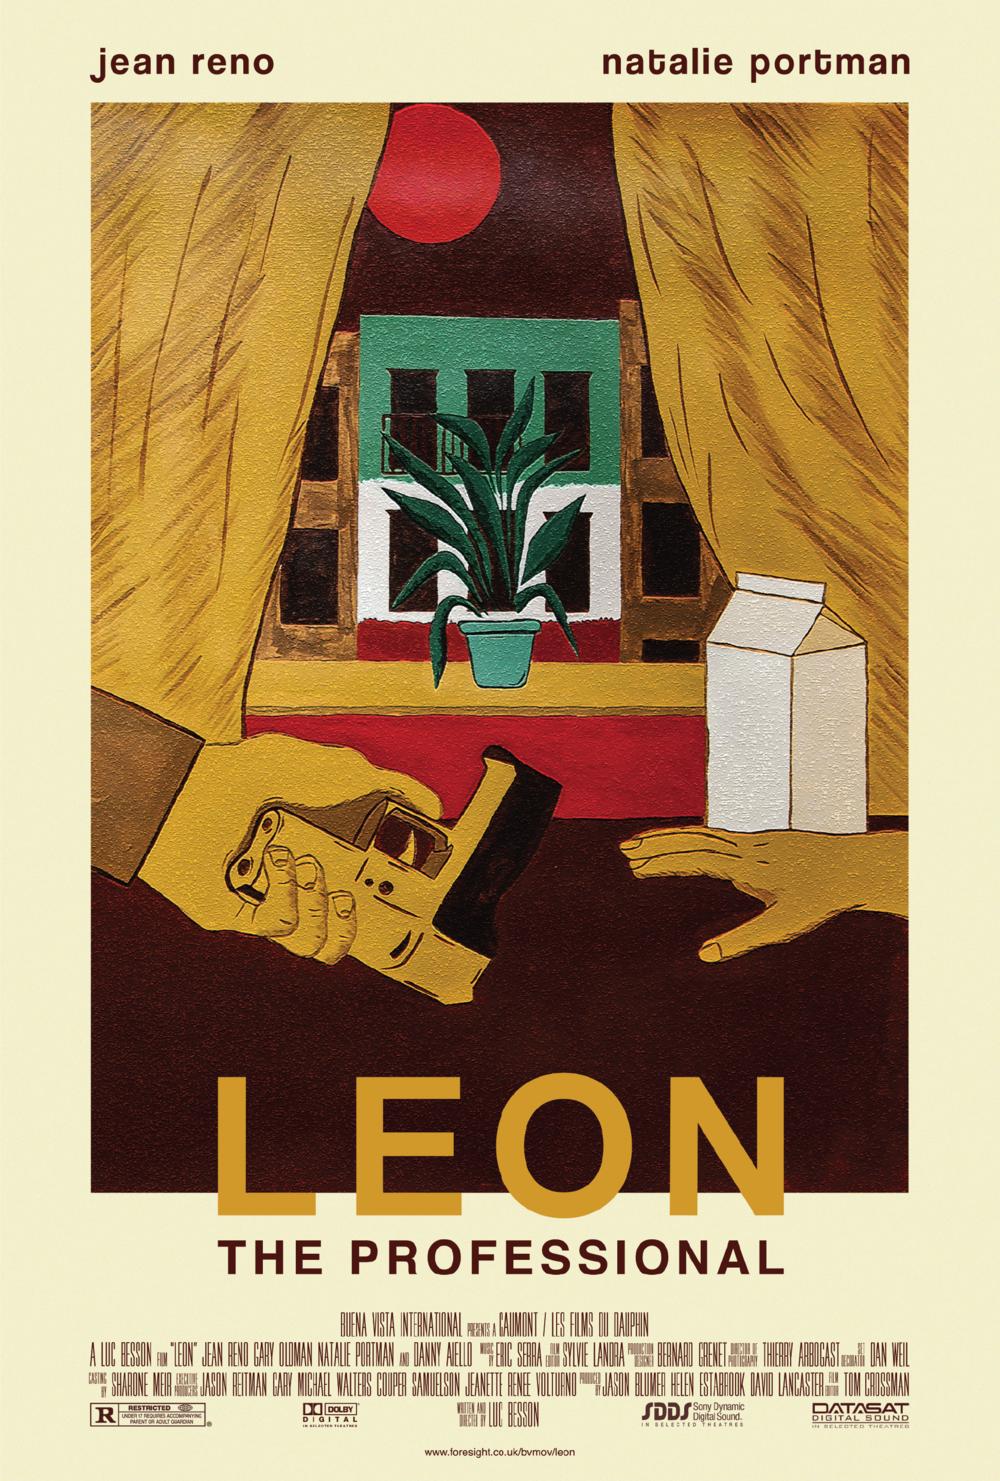 leon the professional movie poster carolynn